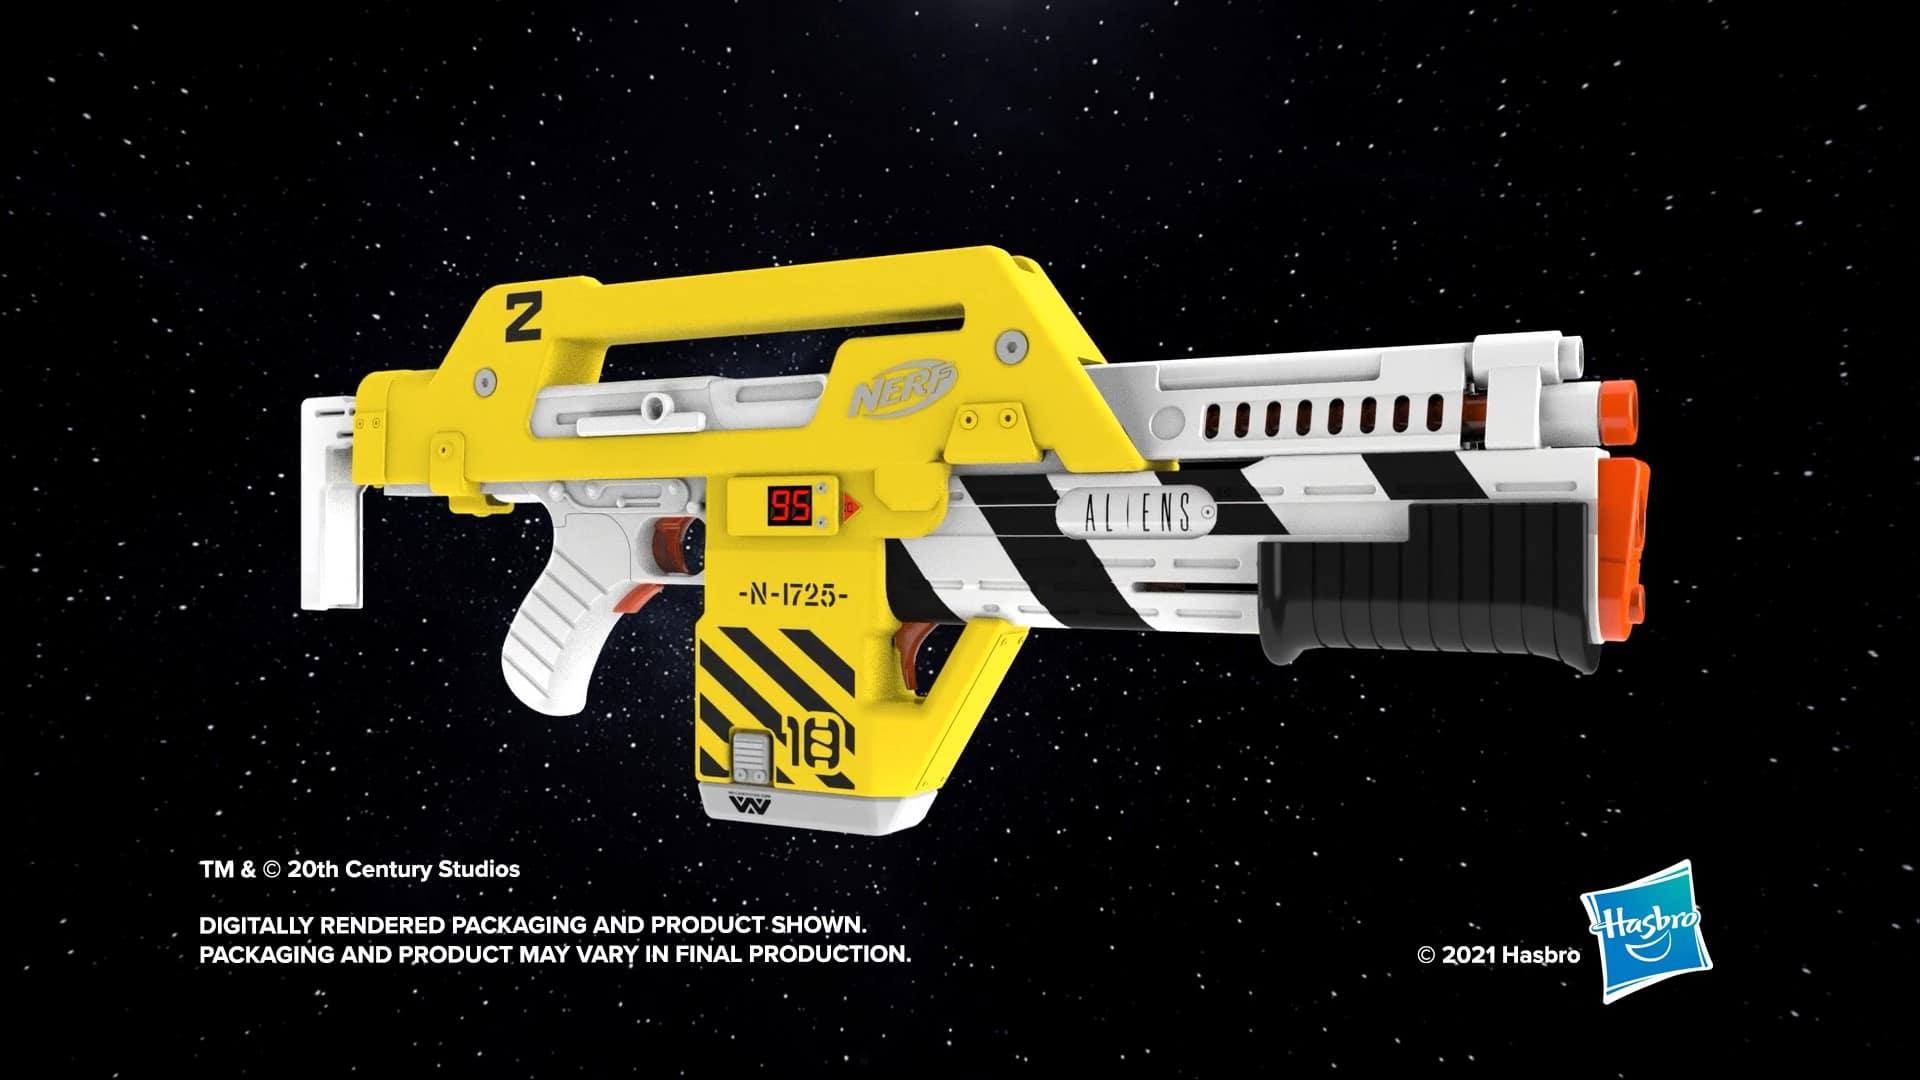 Hasbro creates a Nerf blaster based on the sci-fi film Aliens 17